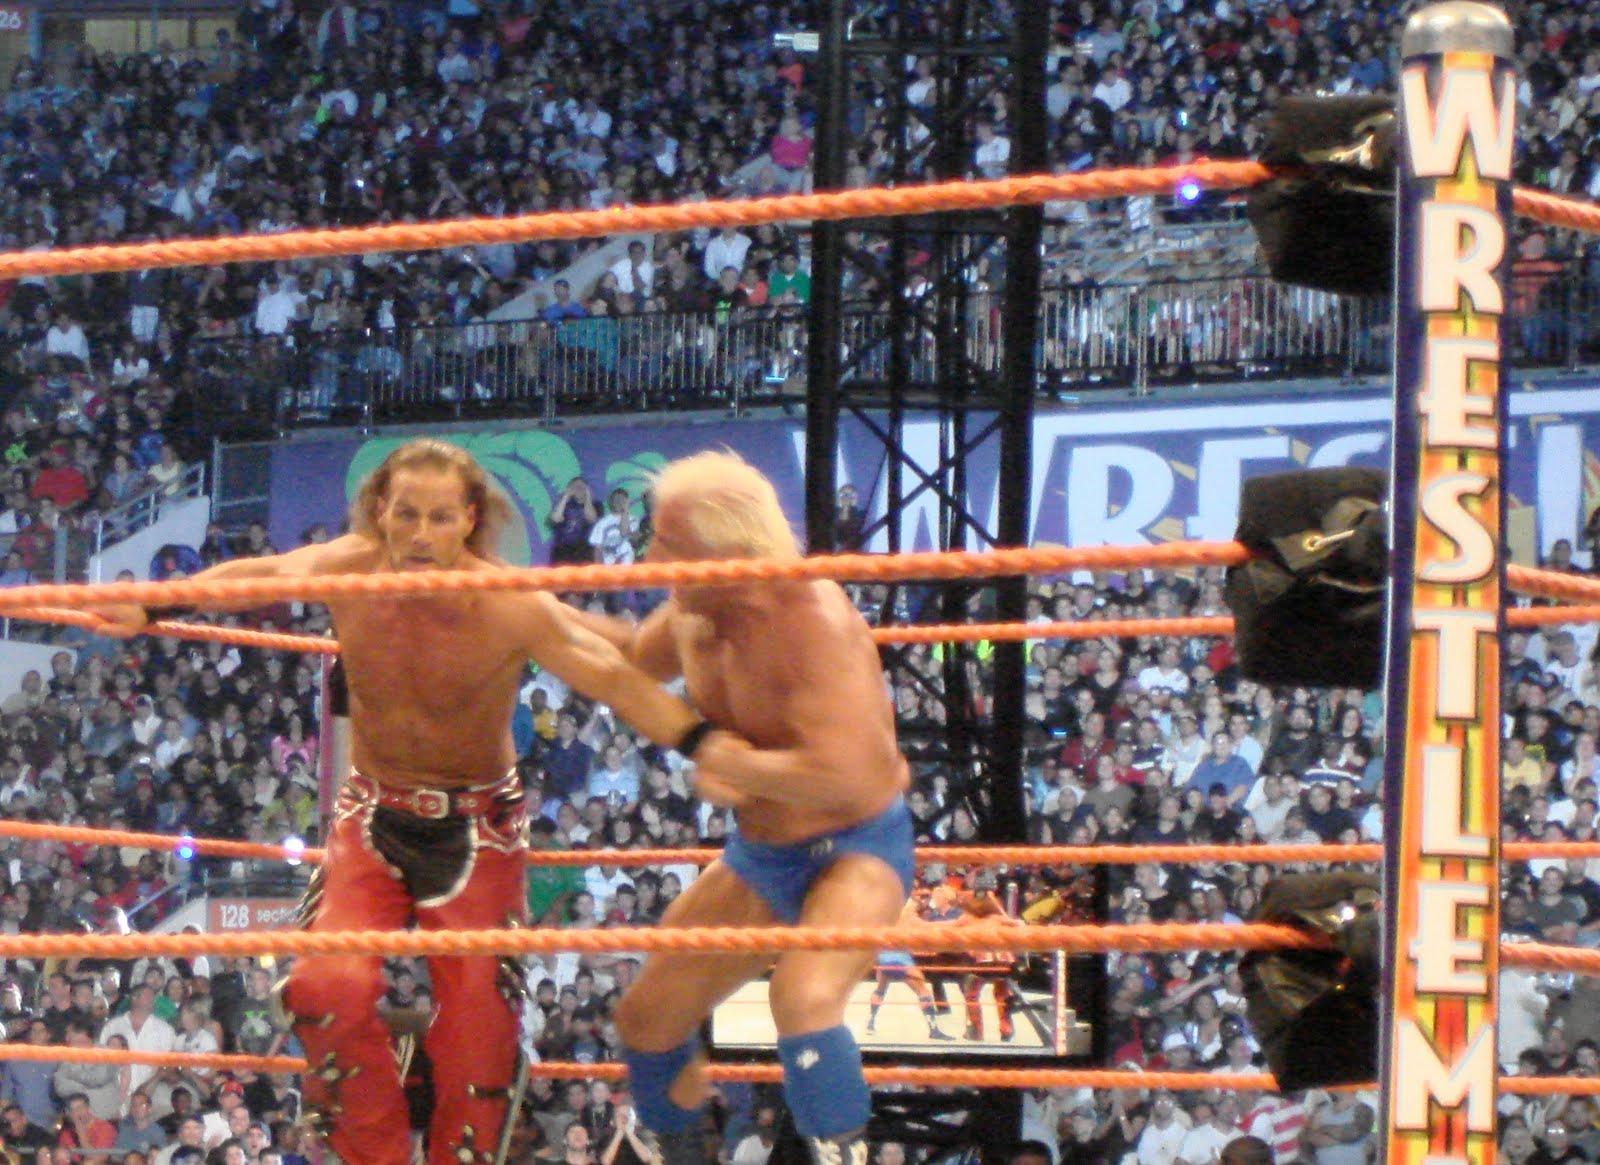 WWE 2K14 (PS3) Wrestlemania 24 (XXIV): Shawn Michaels vs